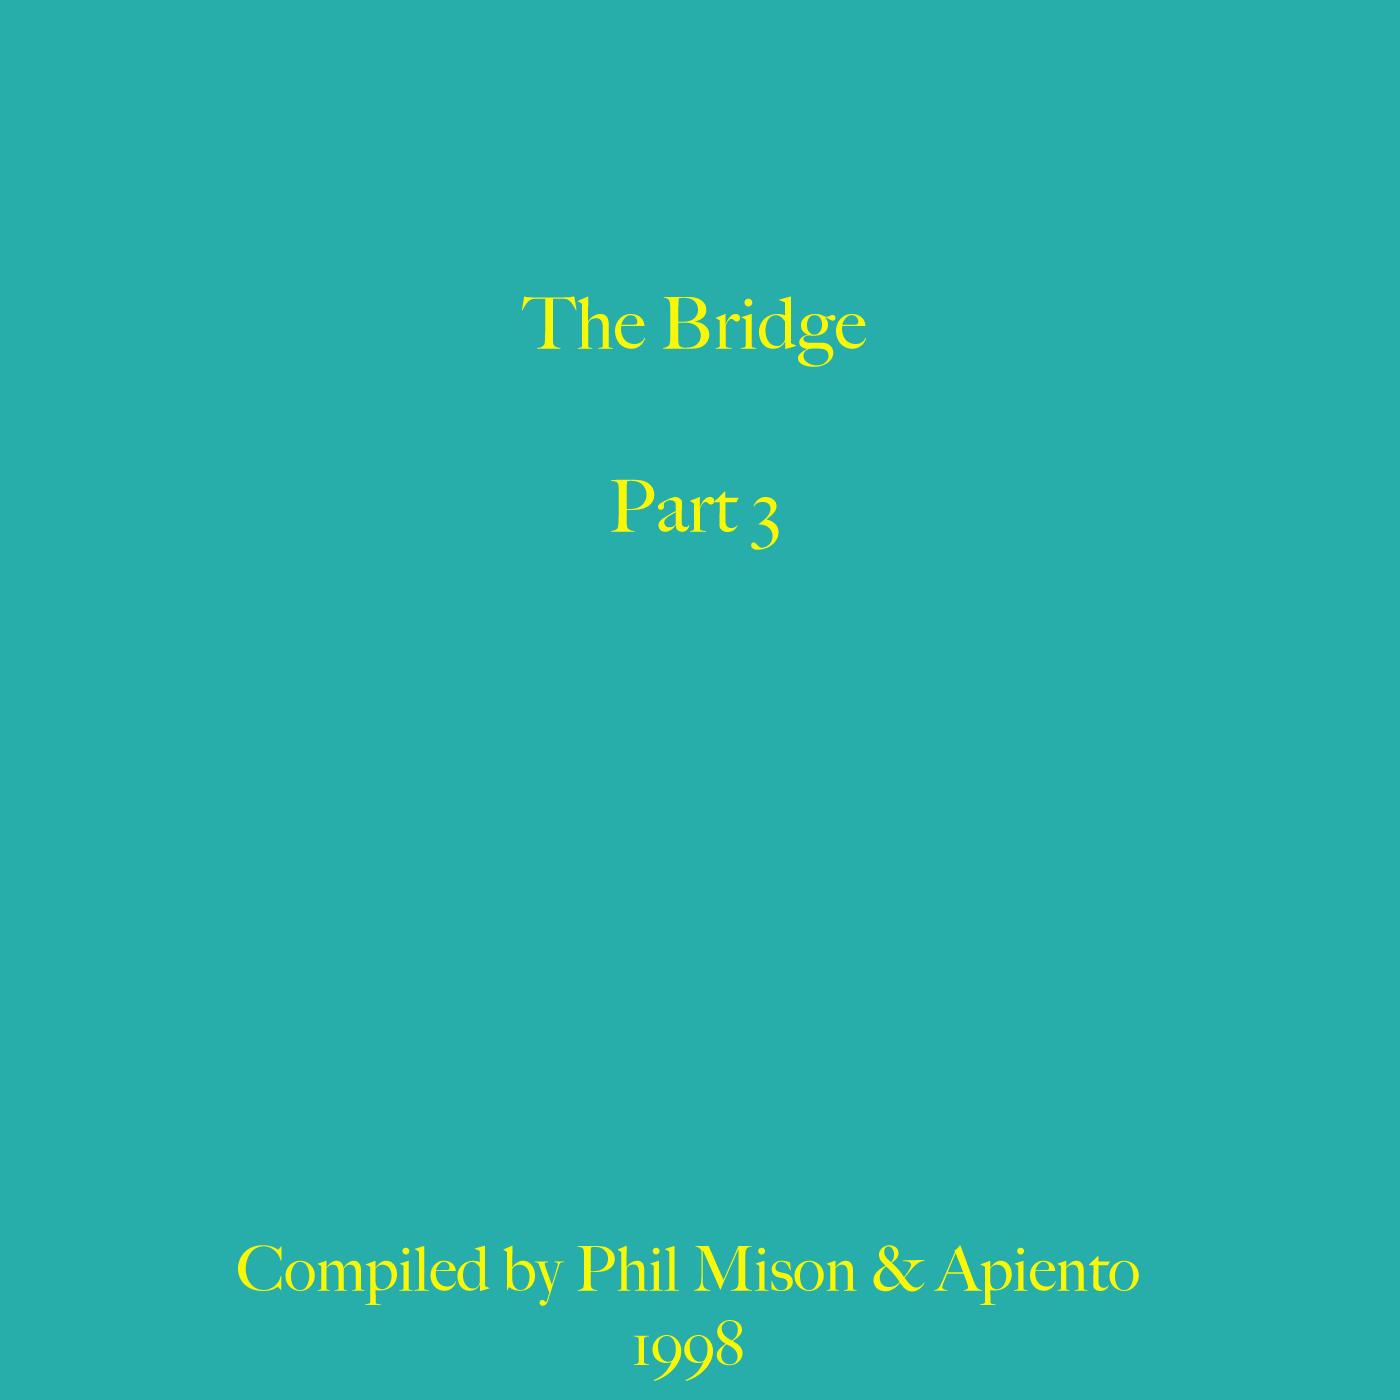 Phil Mison, Apiento, The Bridge, 1998, Mix, Chill Out Room, Test Pressing, Mix, Mellow,